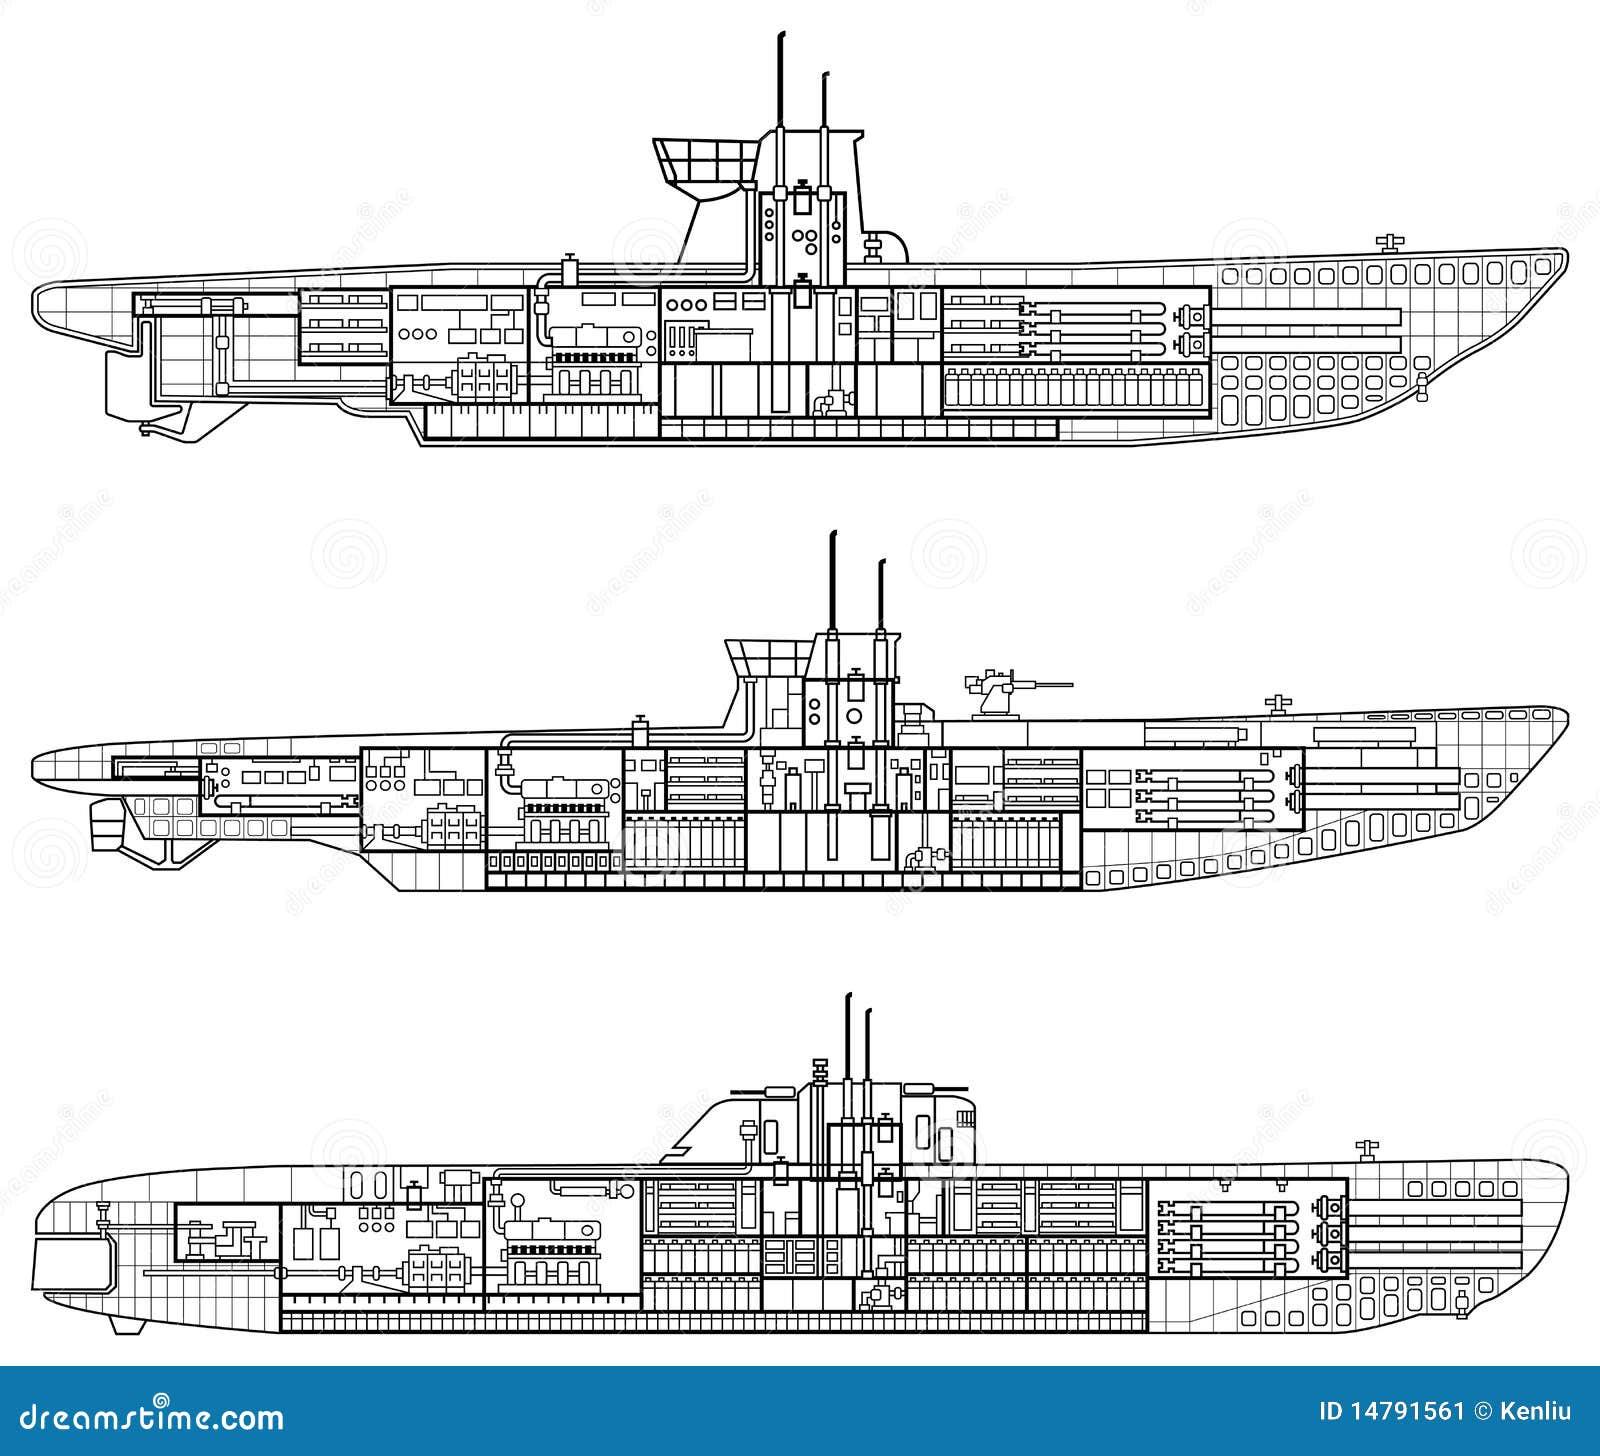 layered vector illustration of 3 kinds of german u-type submarine